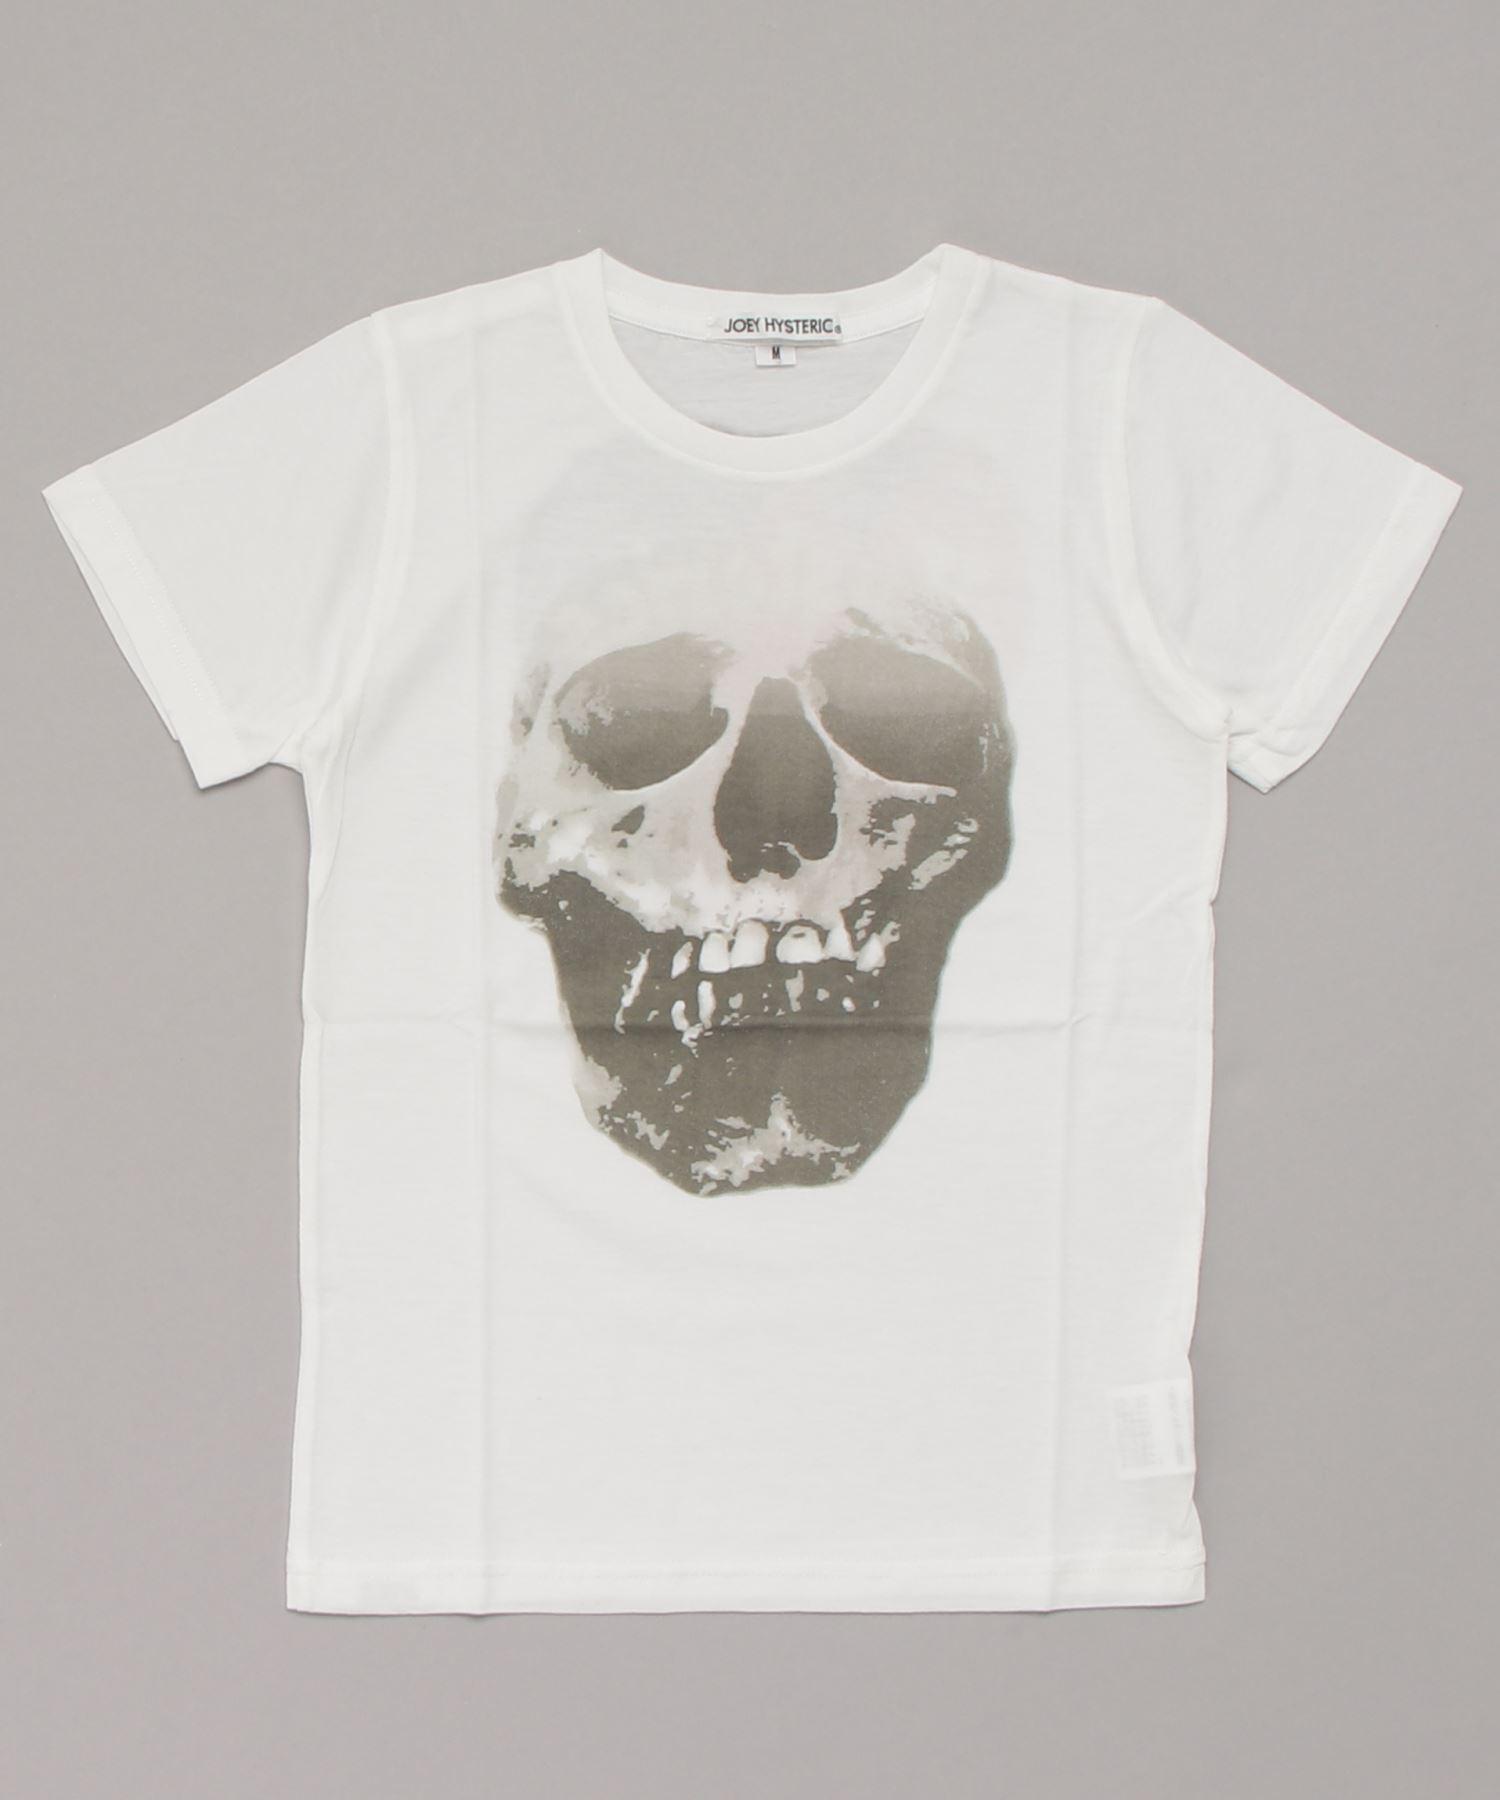 SKULL BERRY pt Tシャツ(XS-M)